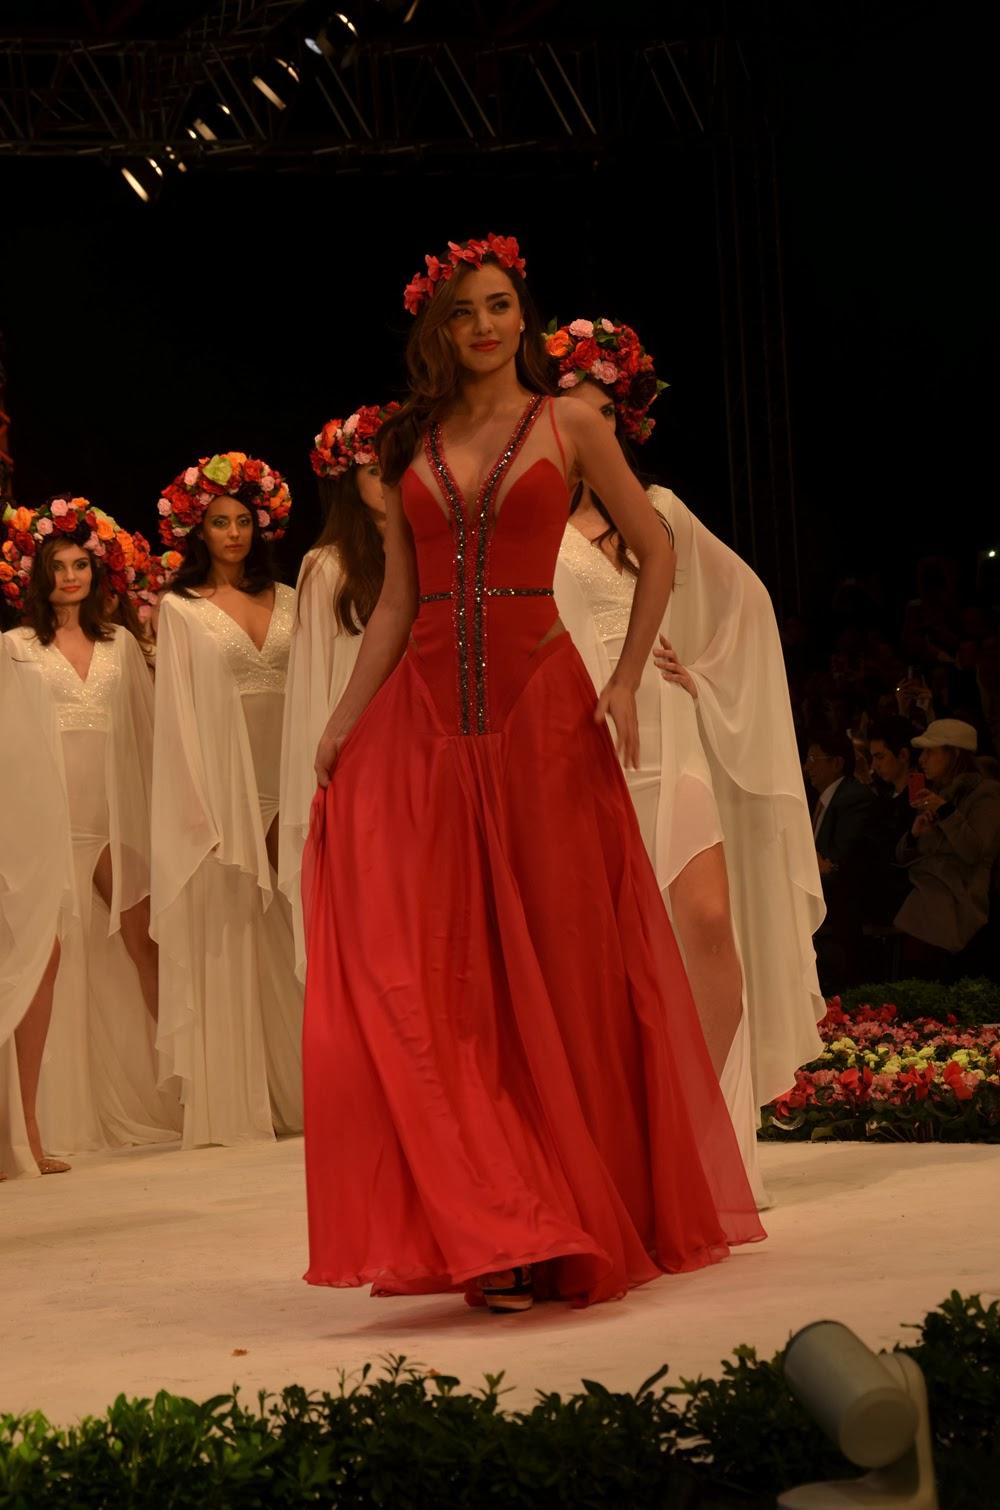 Dosso dossi fashion show antalya 39